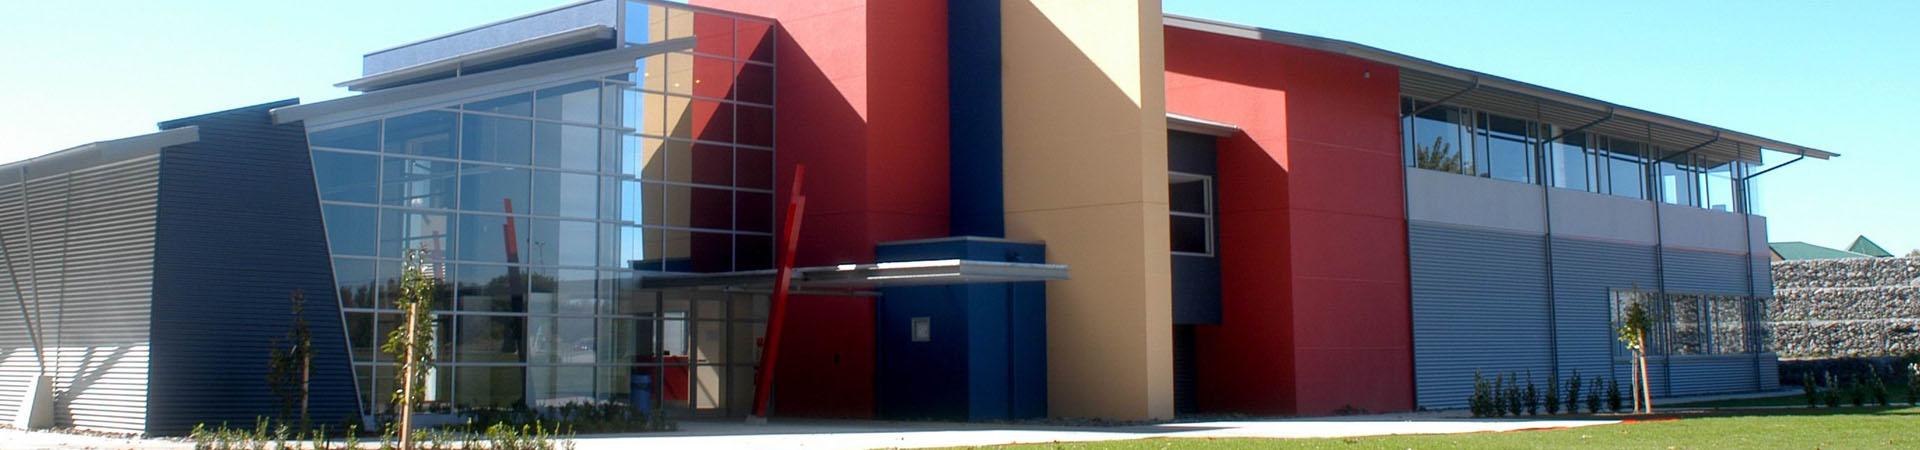 EIT_Building_1920x450